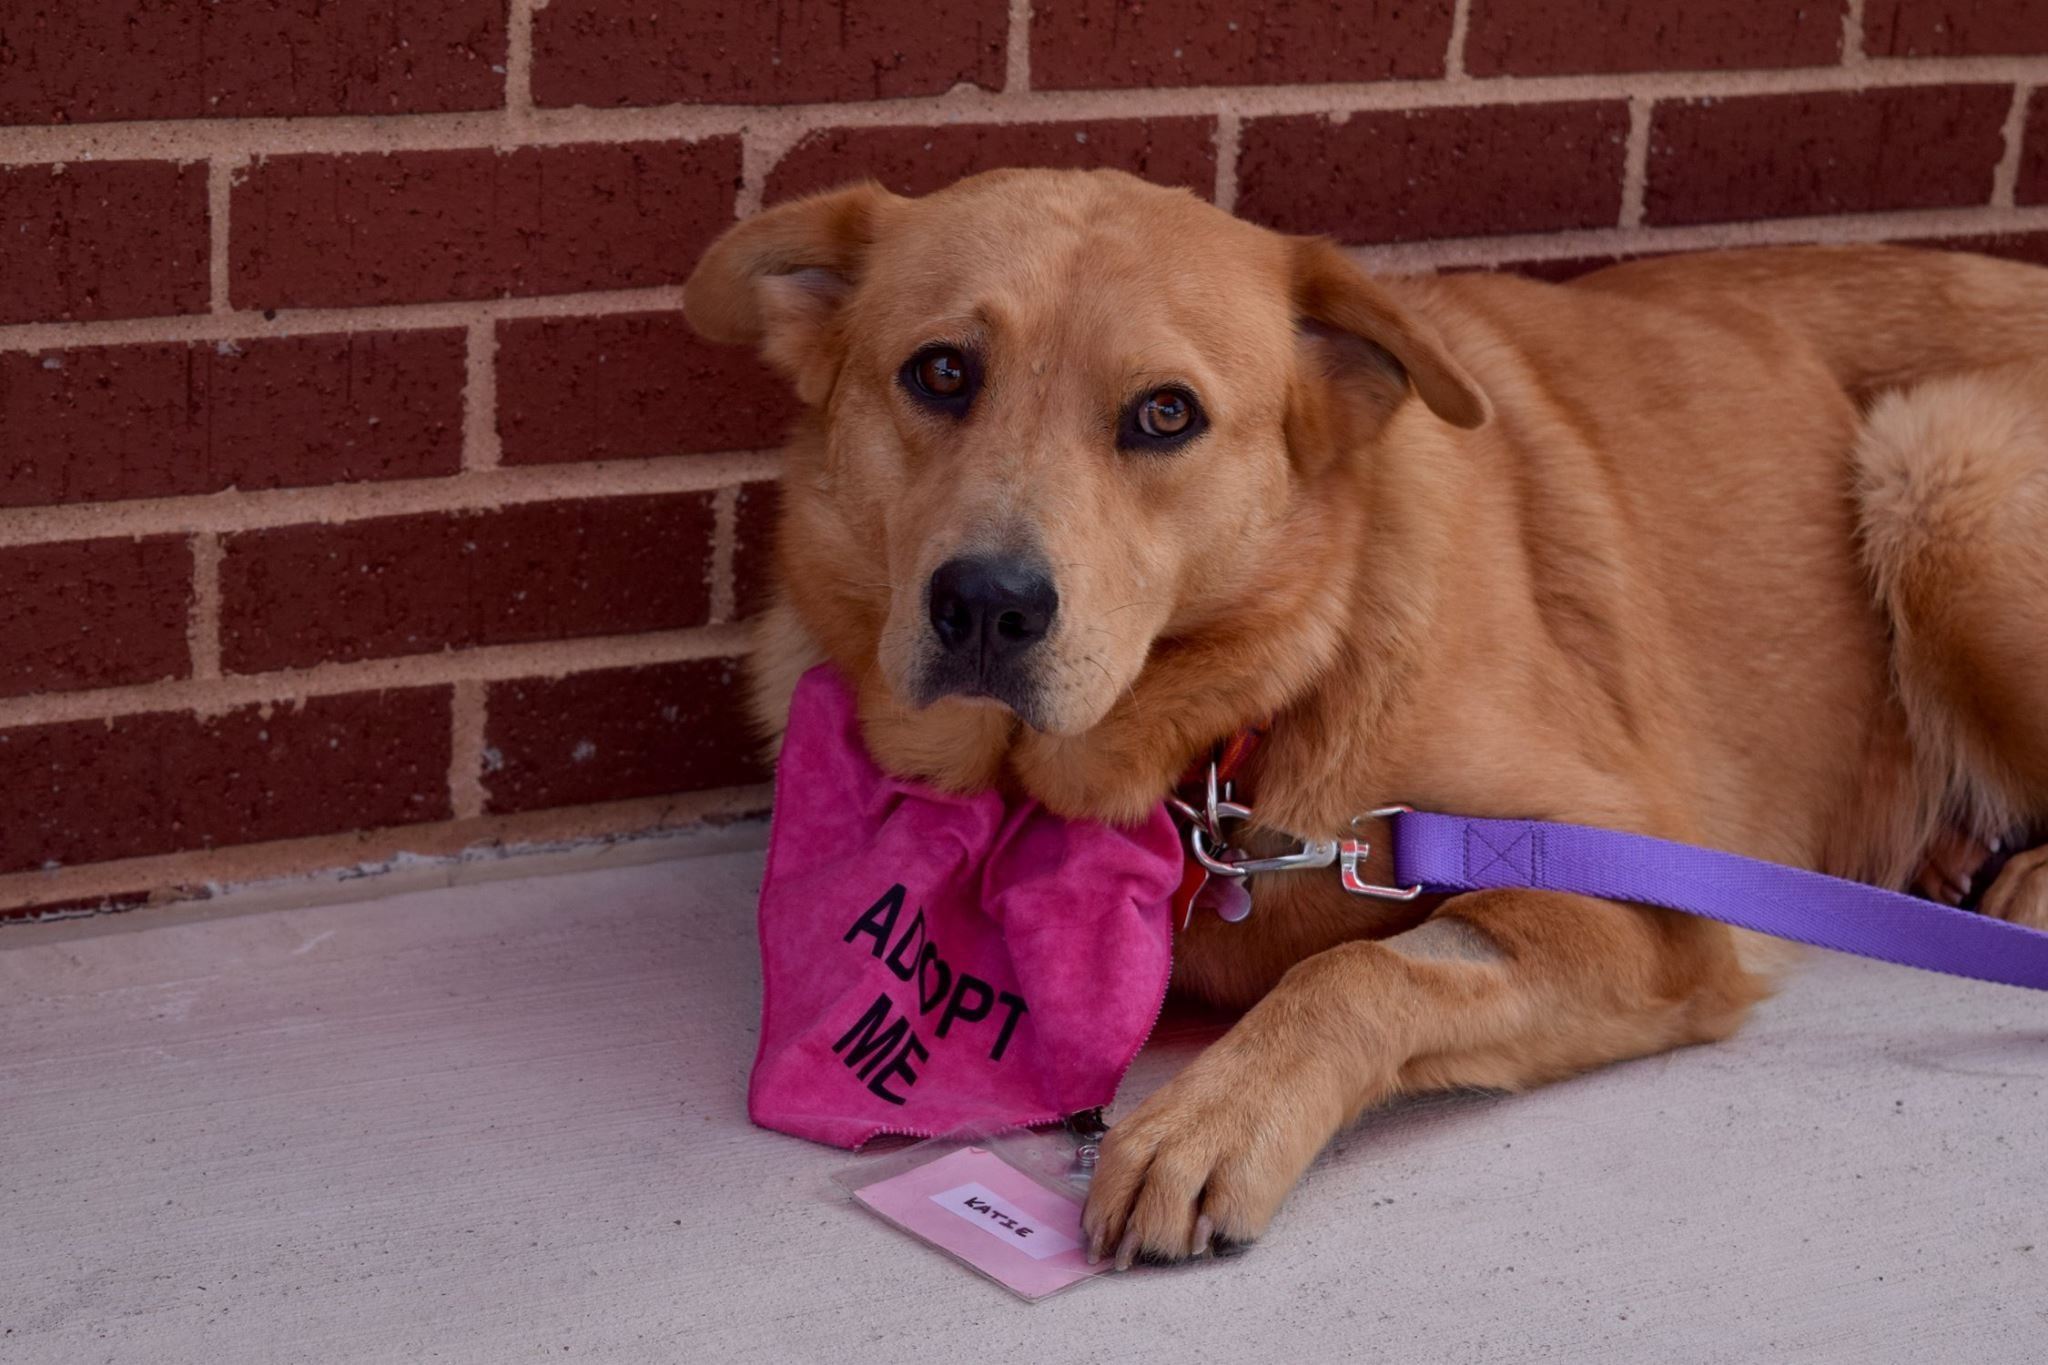 Golden Retriever dog for Adoption in FORT WORTH, TX. ADN